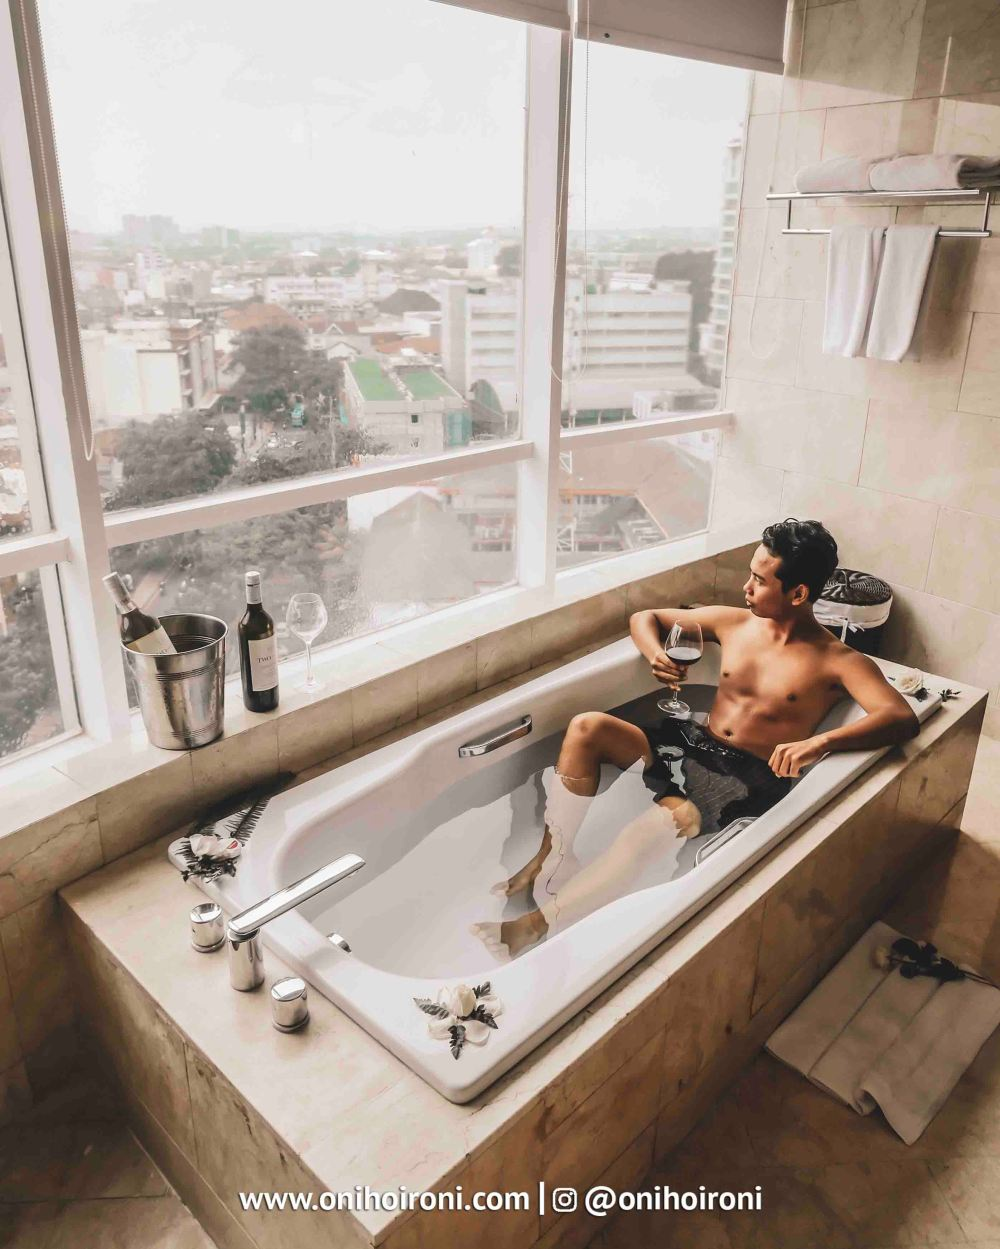 4 Room bathtubCrowne Plaza Bandung Oni Hoironi